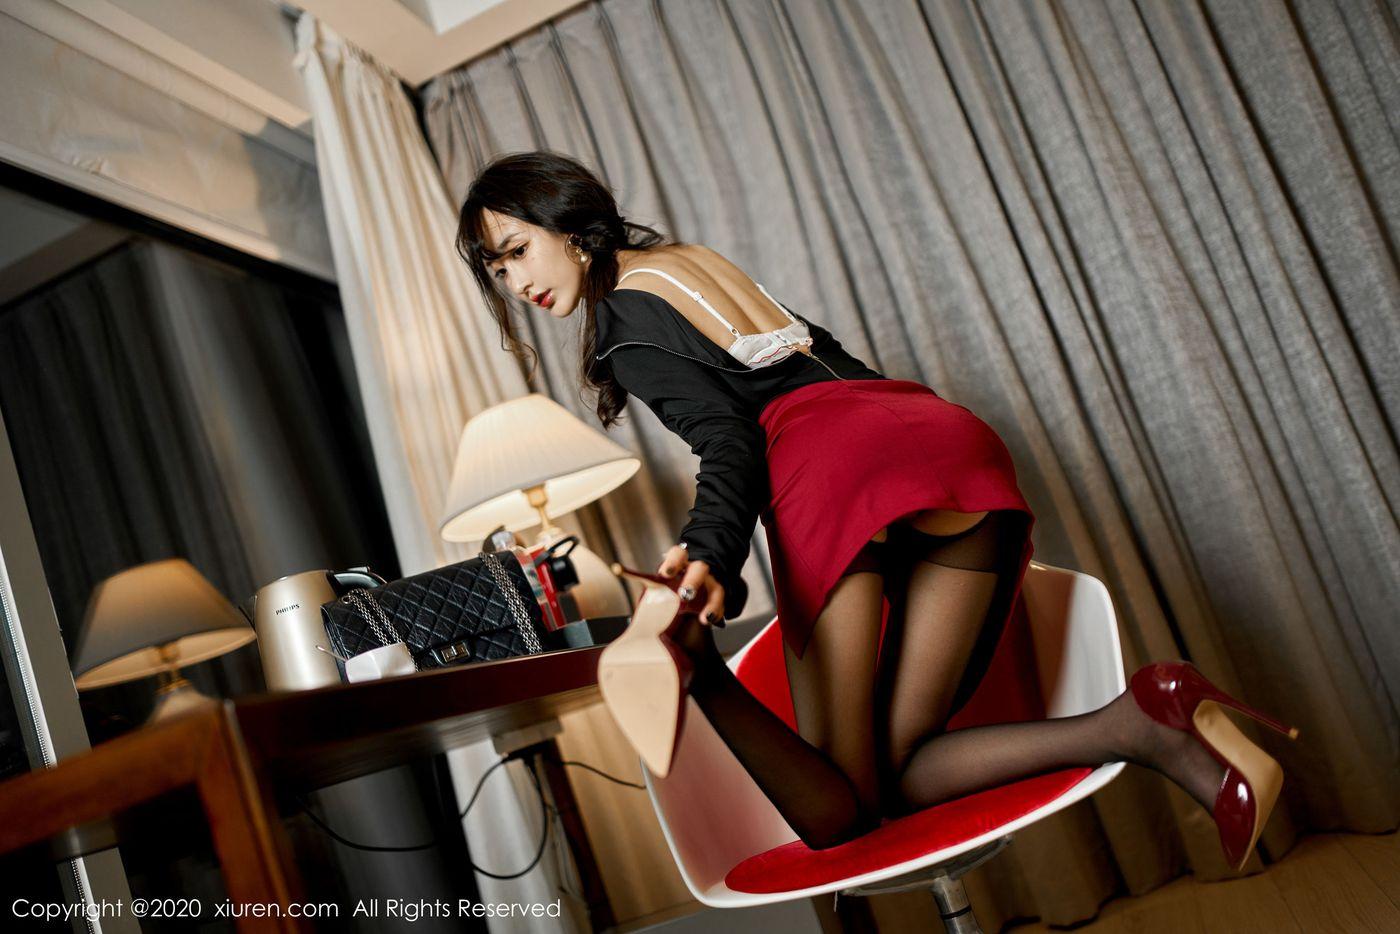 Vol.918 黑丝美腿内衣诱惑美胸嫩模翘臀美女模特秀人网-林子欣完整私房照合集